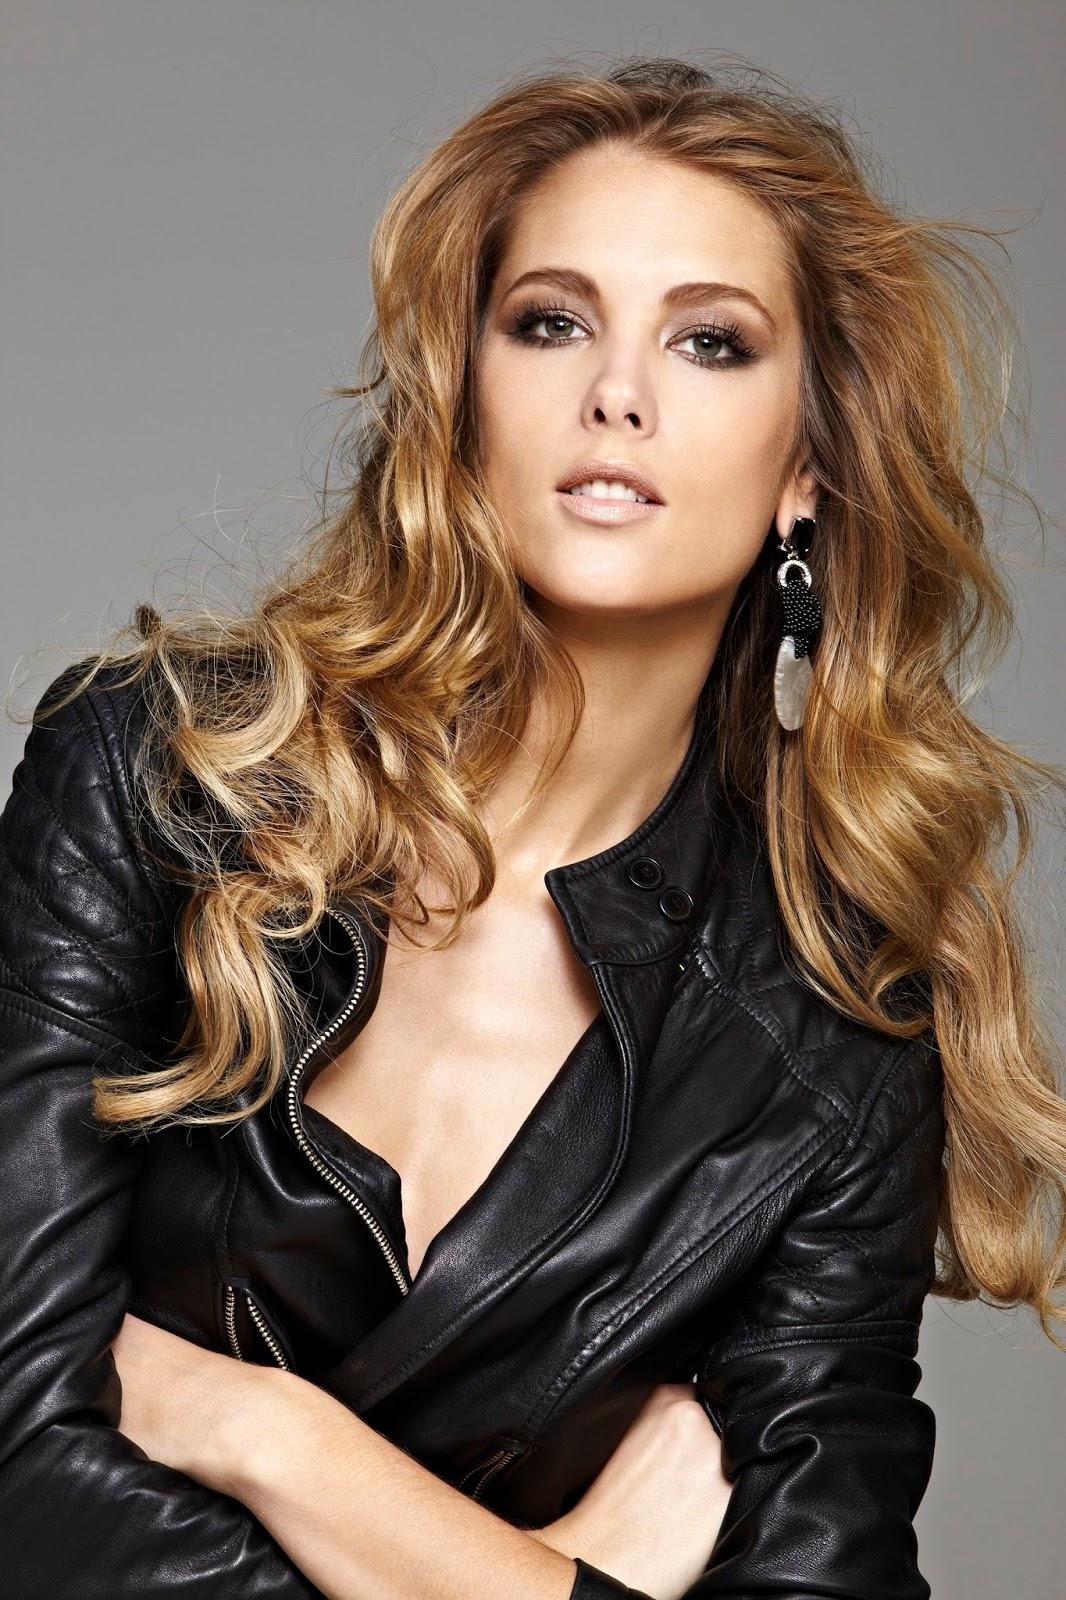 Parul Chauhan 2007,Kate Beckinsale XXX image Rebecca Addelman,Danny Dyer (born 1977)